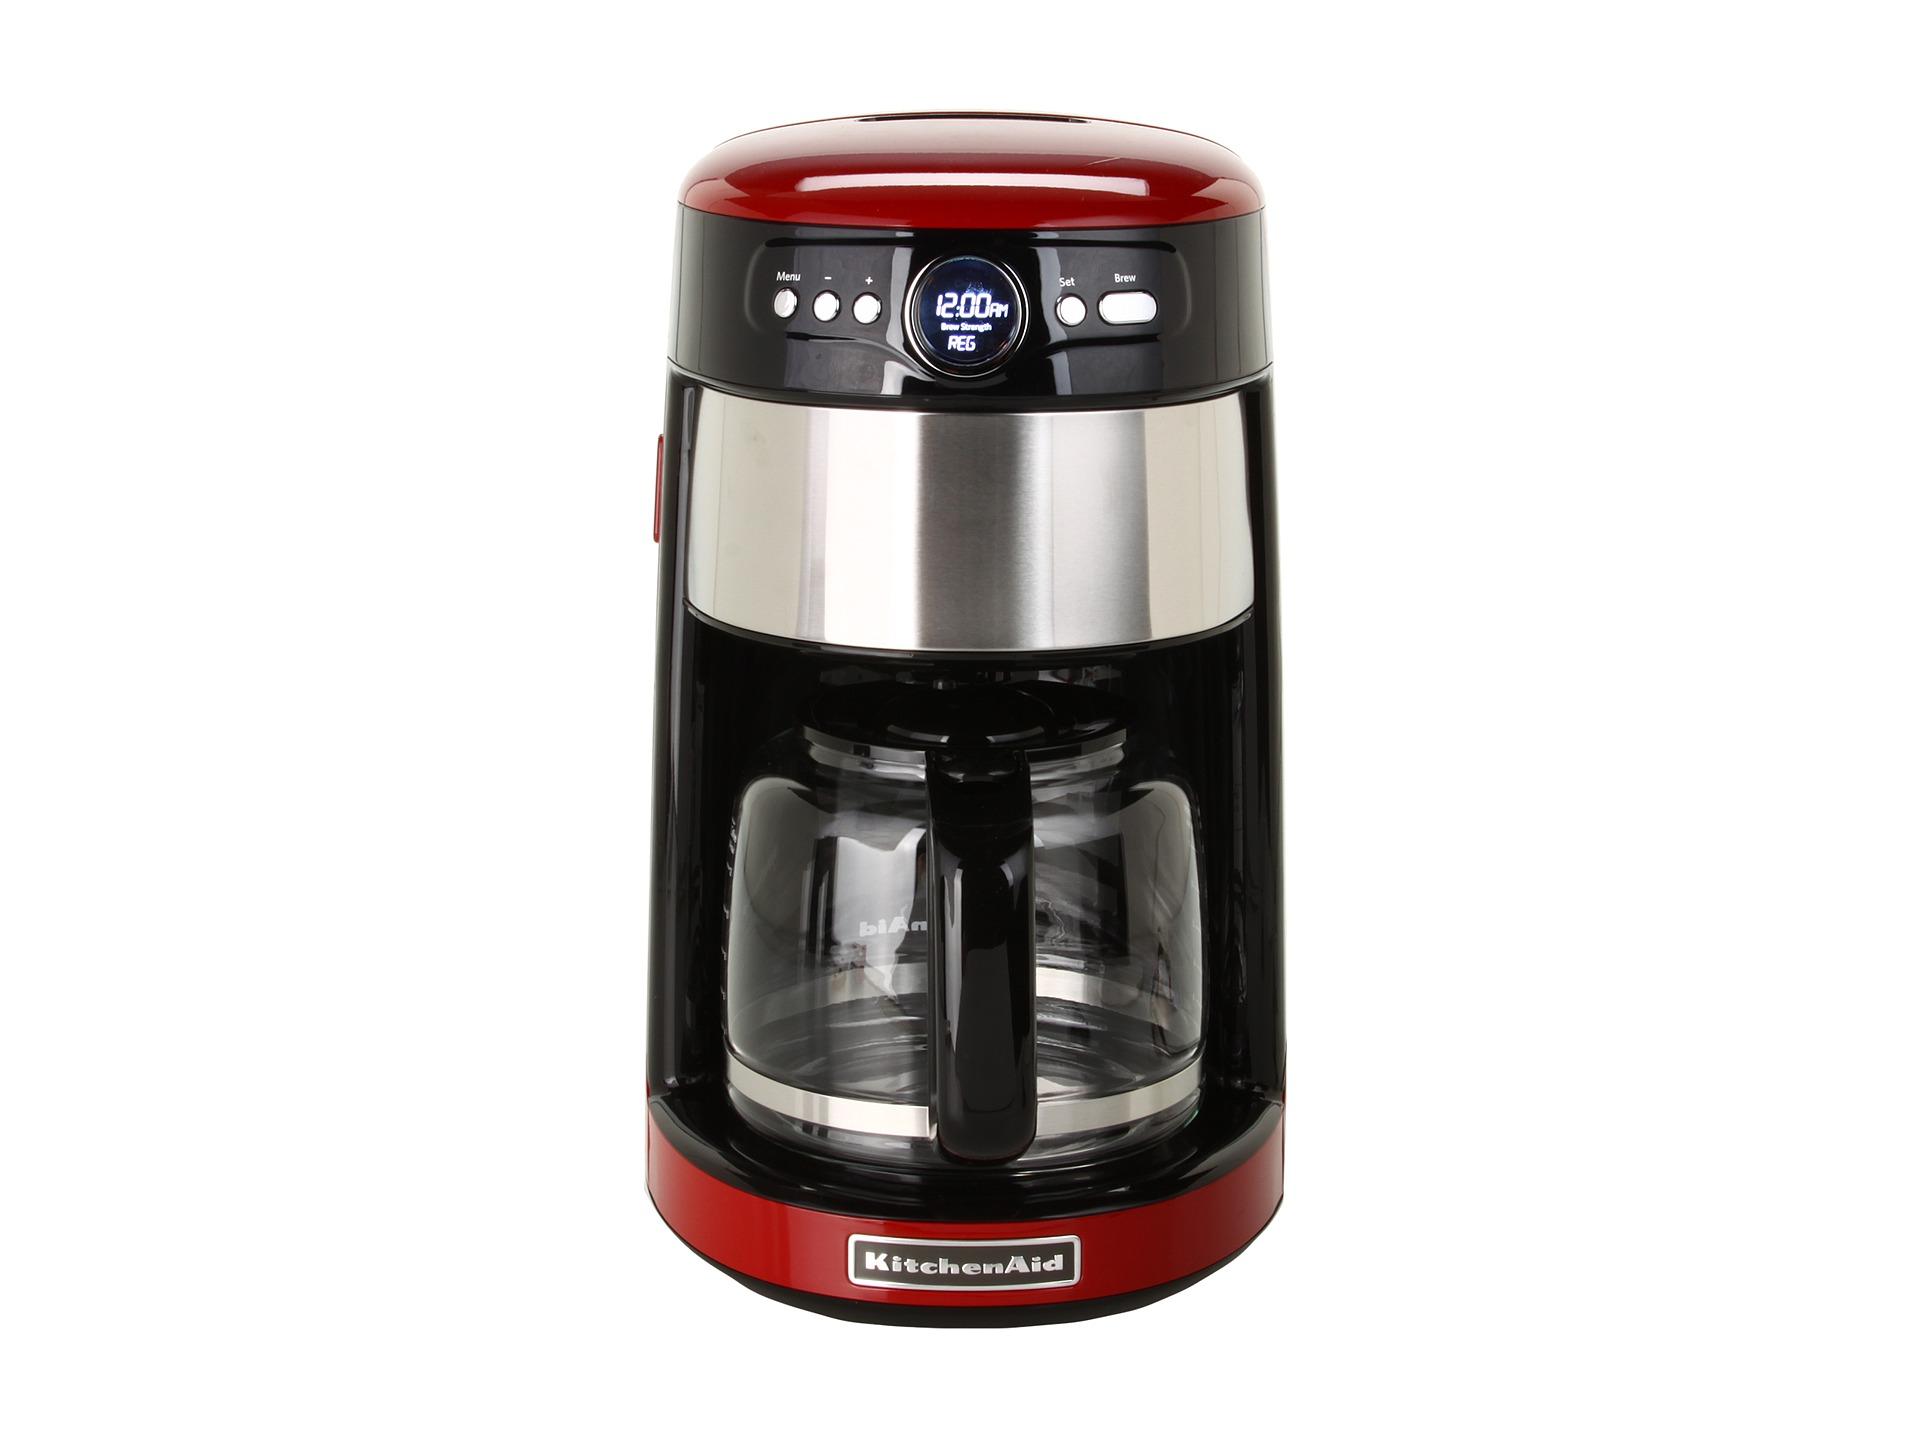 Ovastar Coffee Maker Reviews : Kitchenaid coffee maker reviews Kitchen ideas